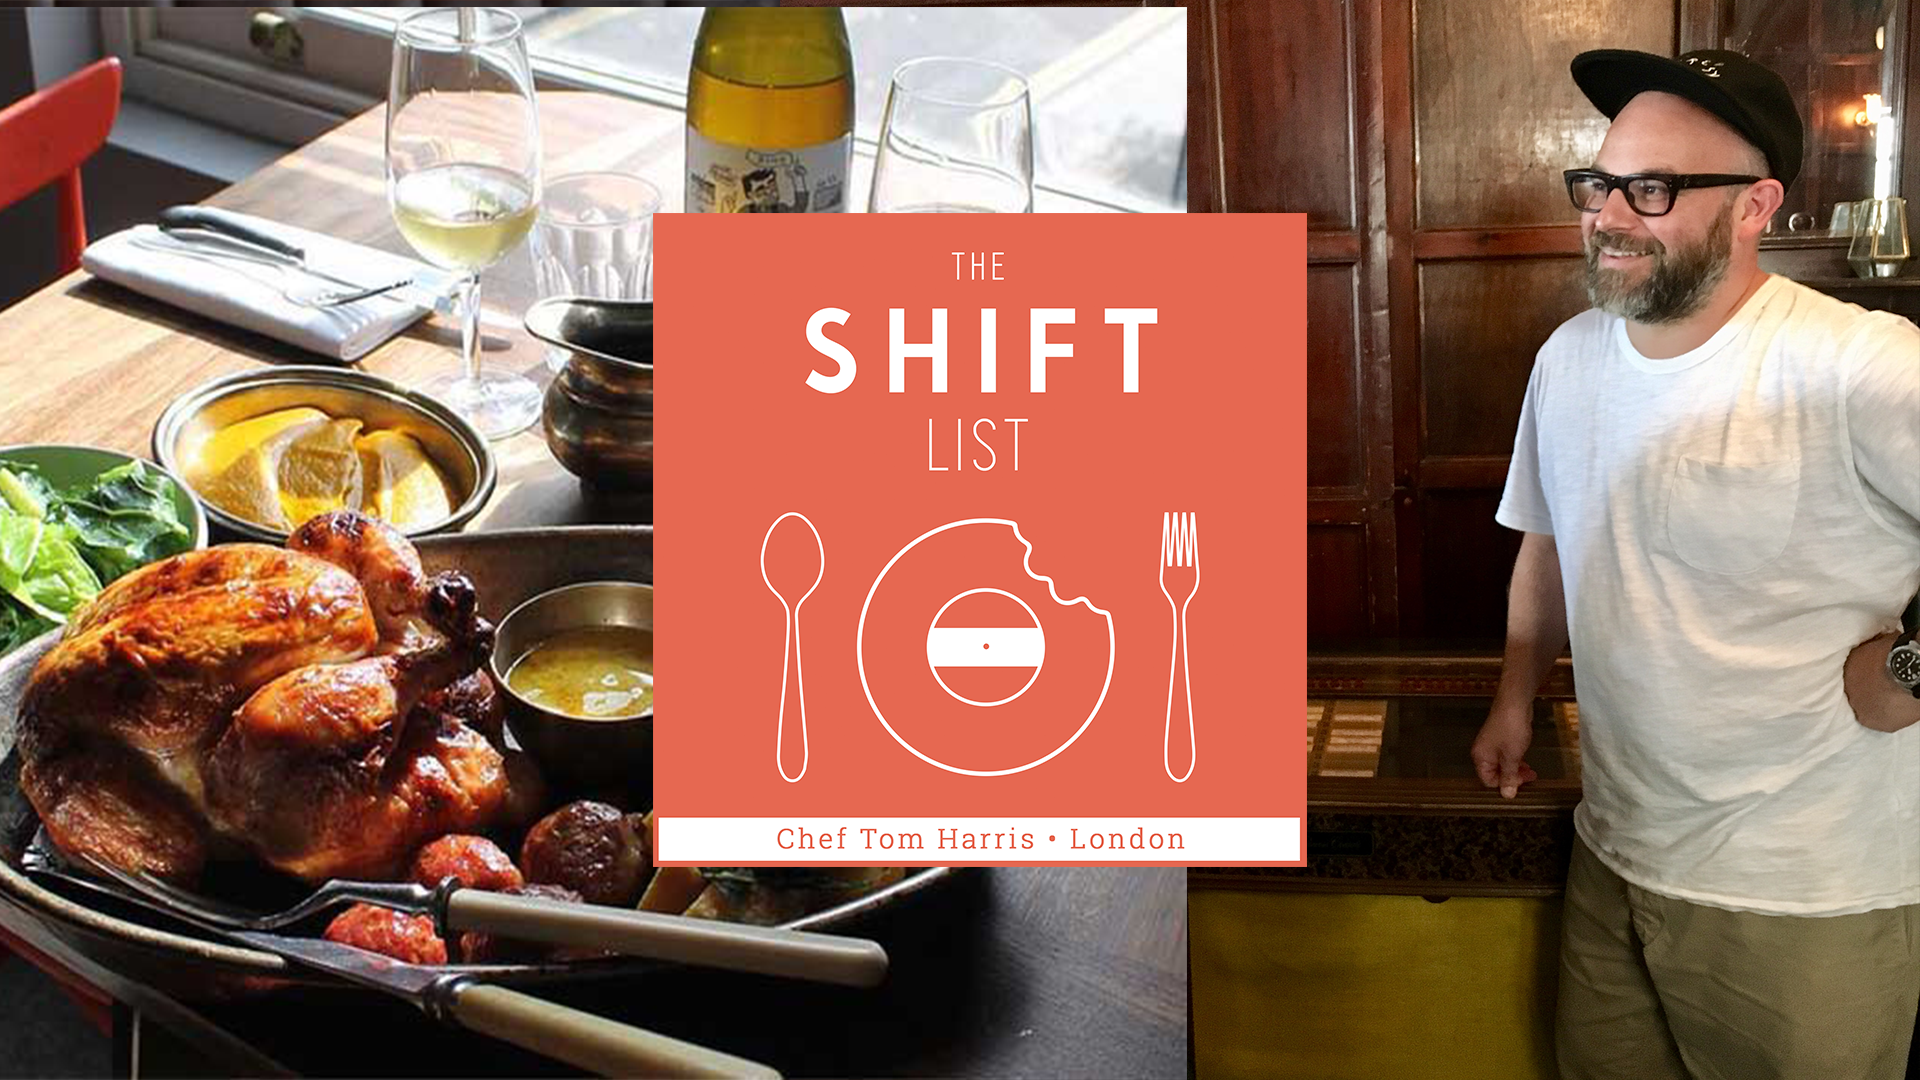 The Shift List - Tom Harris - London (The Marskman, St. John)